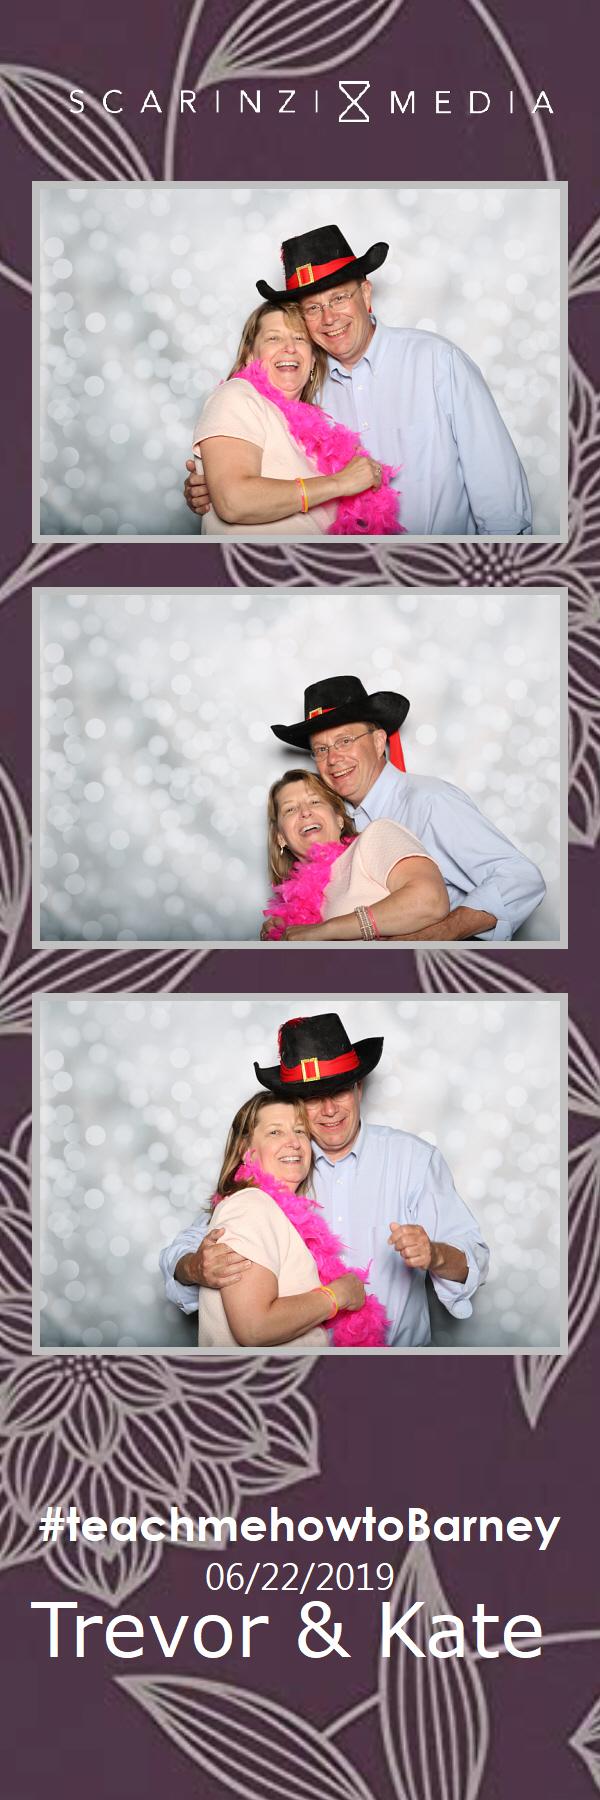 2019.06.22 - Barney Wedding PHOTOBOOTH72.jpg